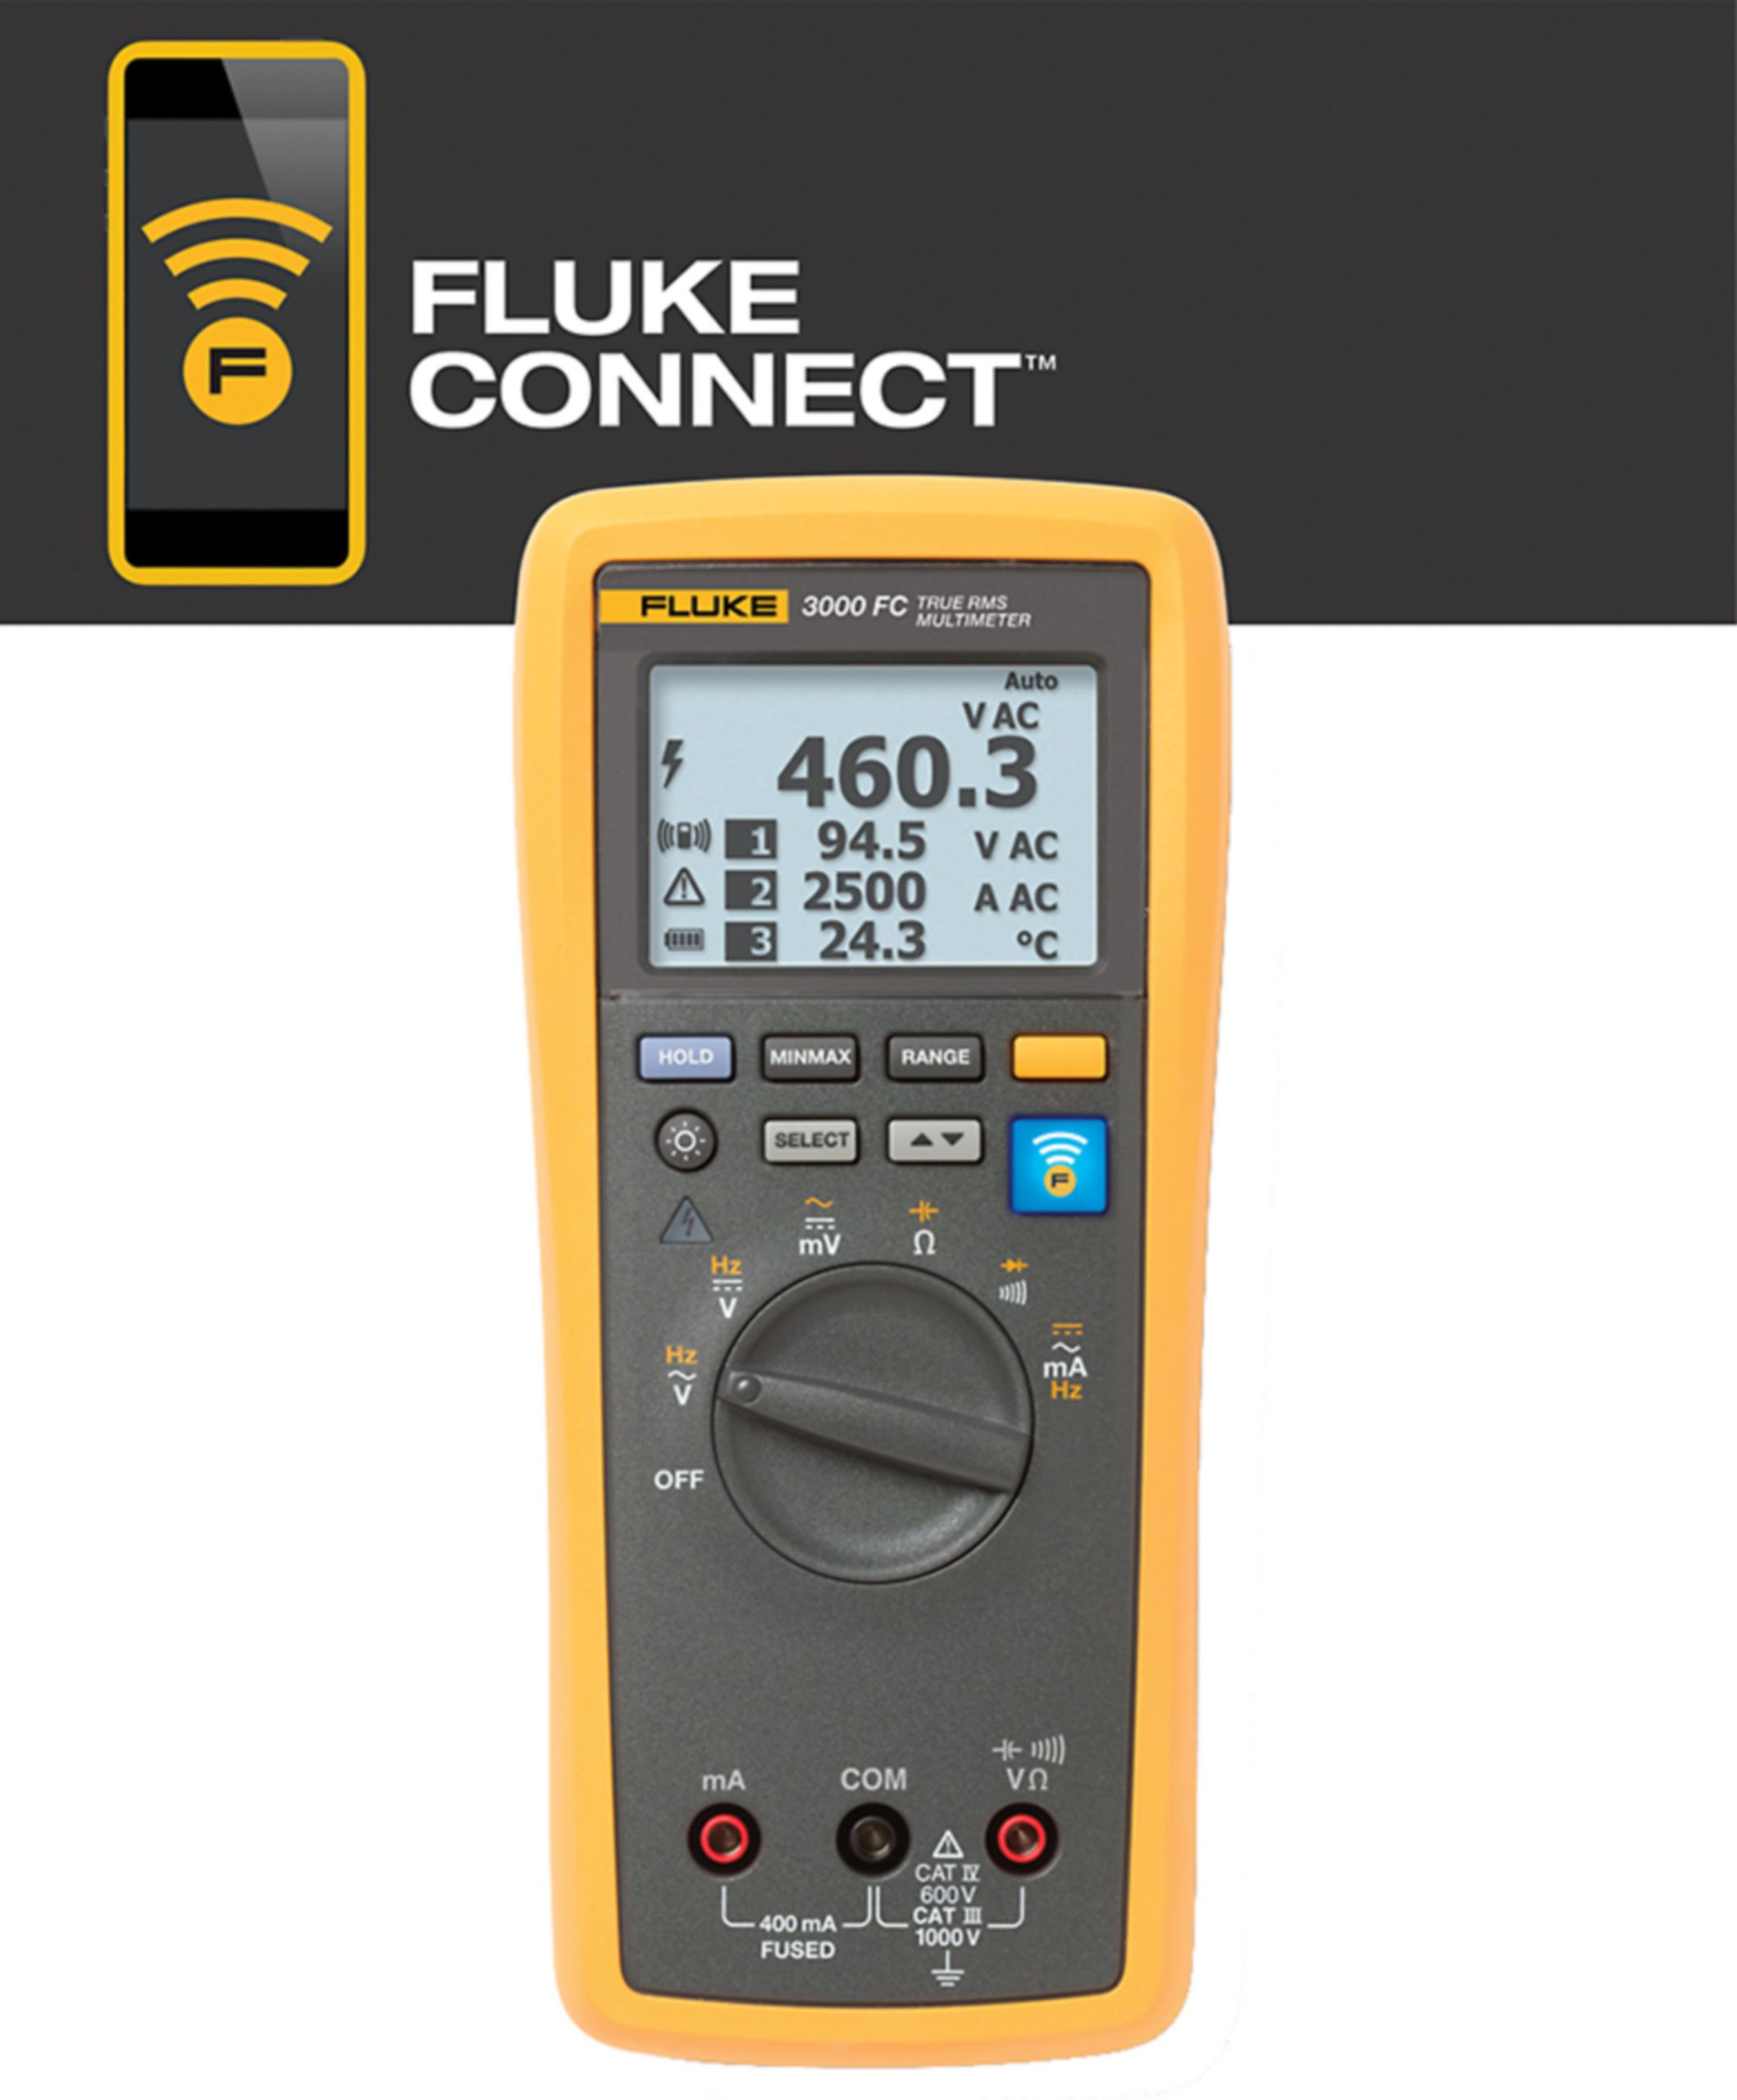 Digitální multimetr TrueRMS Fluke Connect Fluke 3000 FC